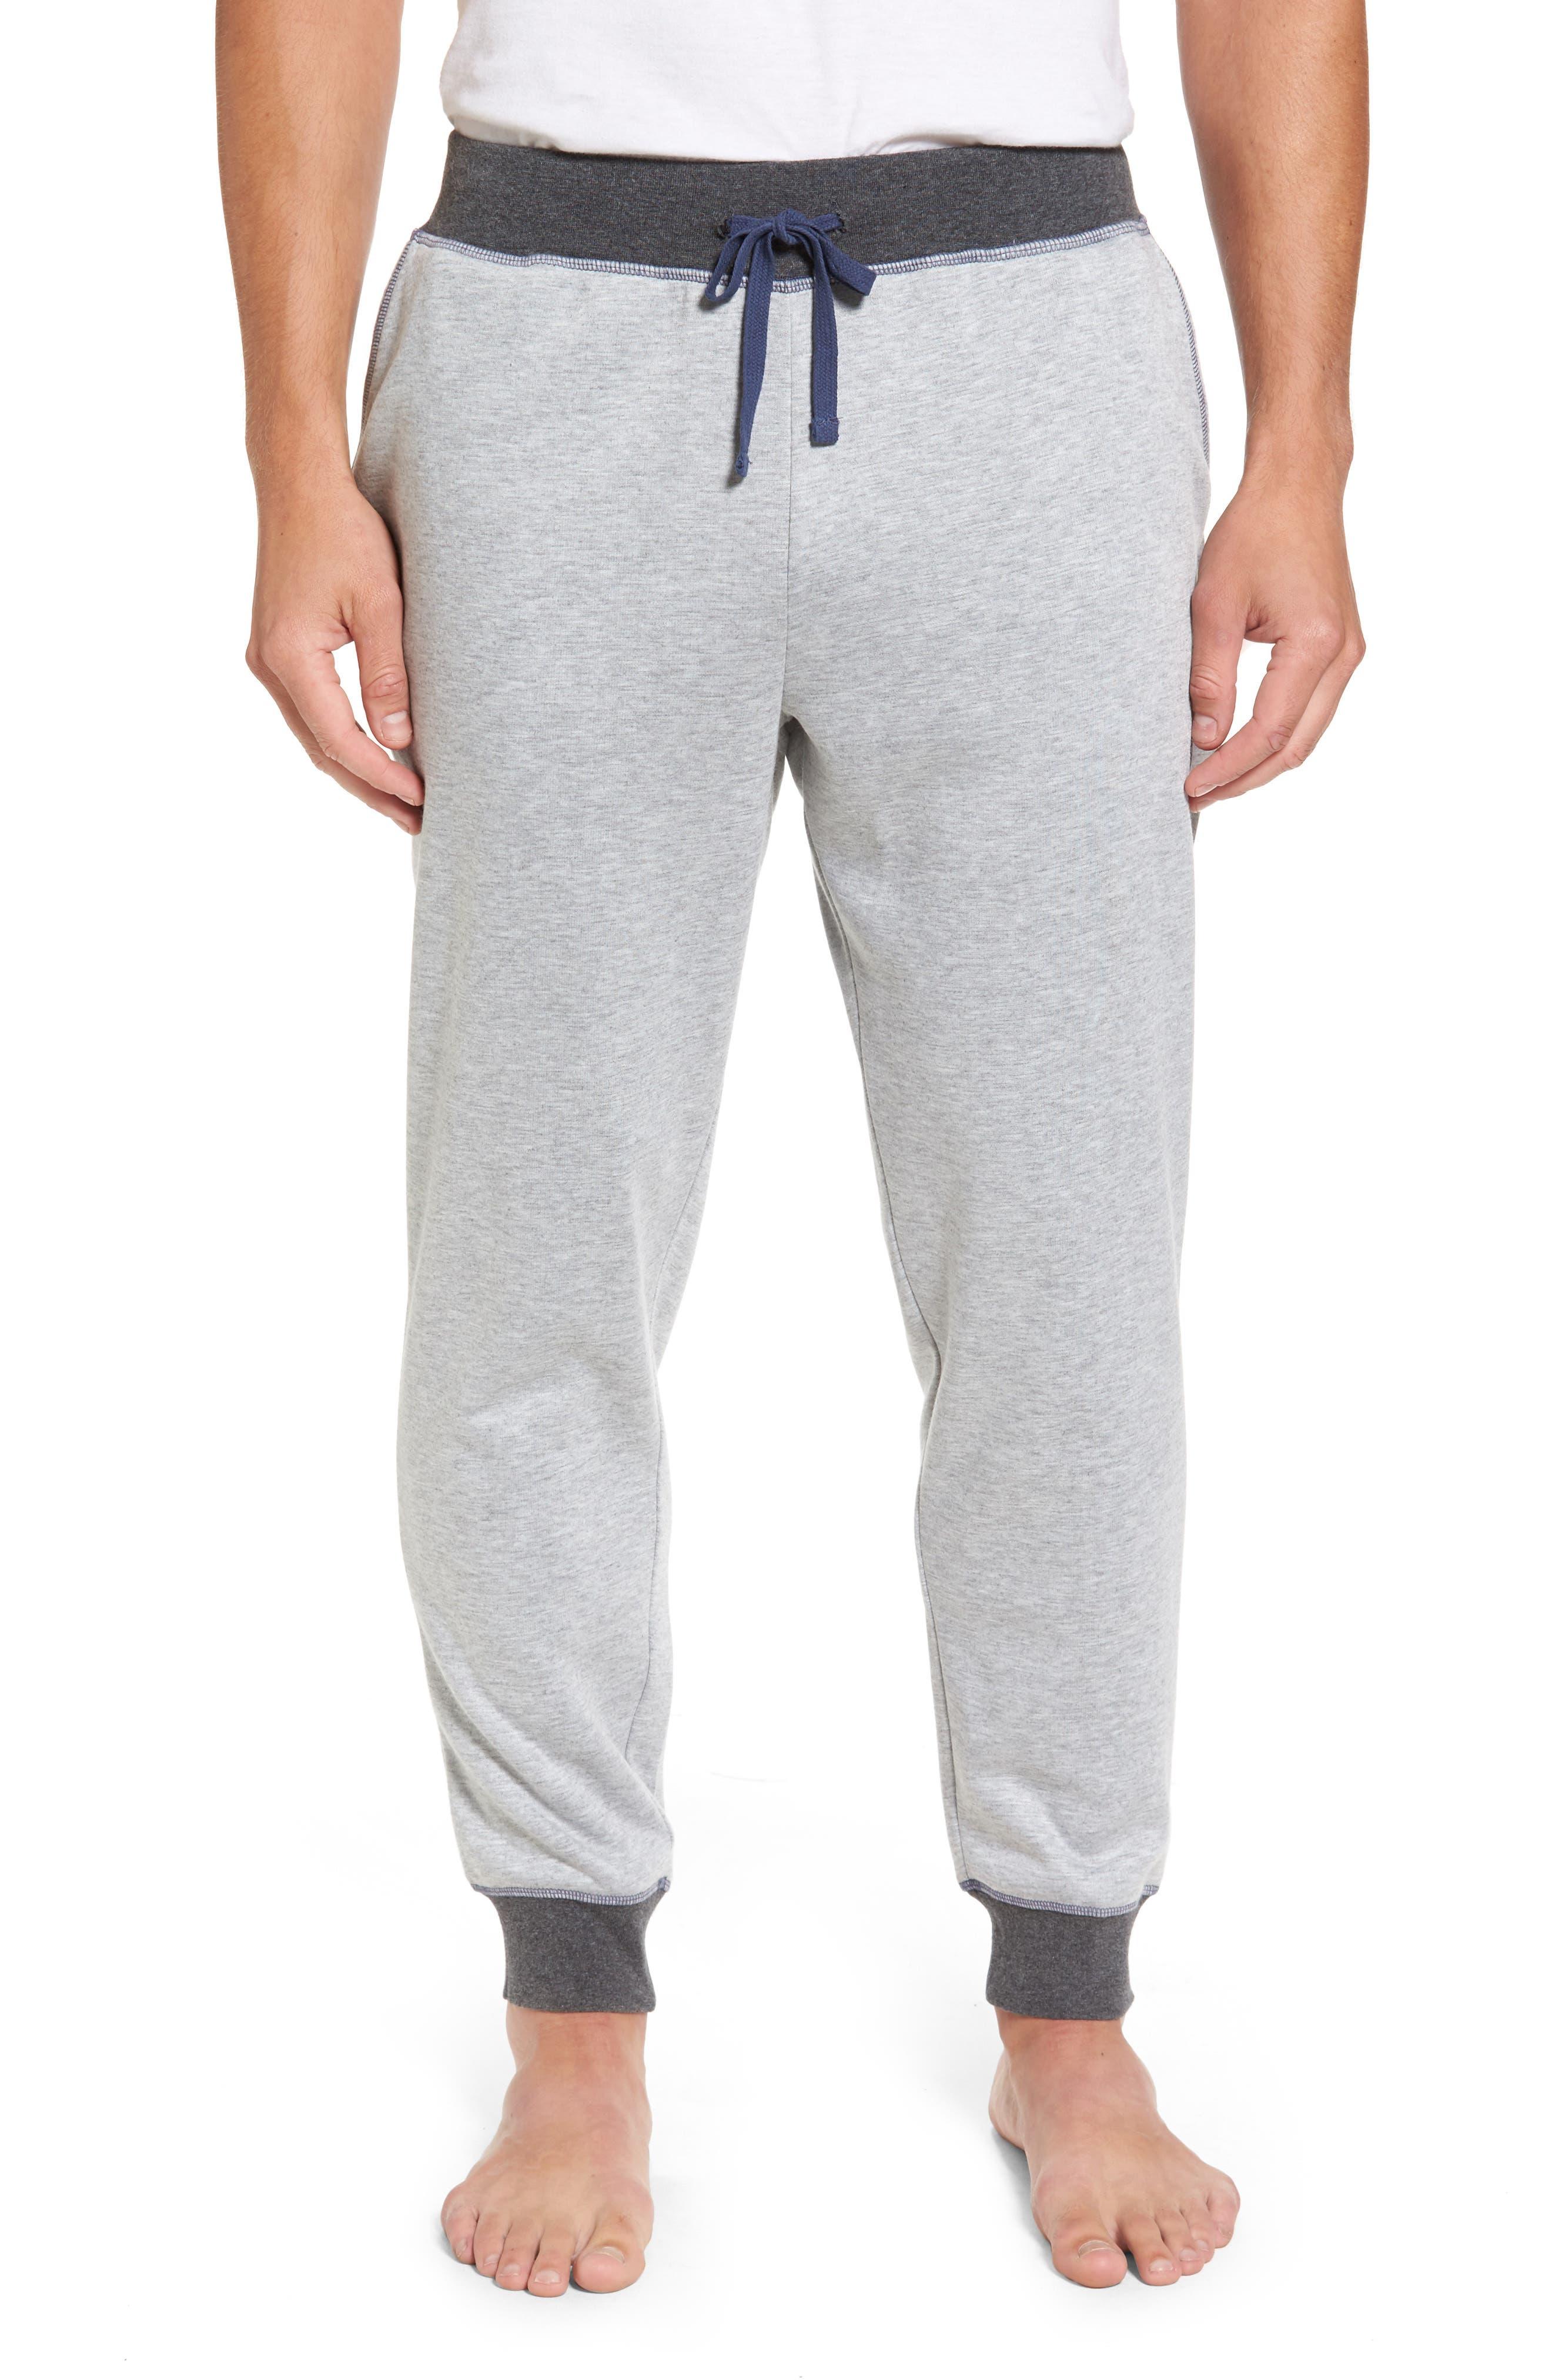 Double Take Knit Lounge Pants,                             Main thumbnail 1, color,                             025